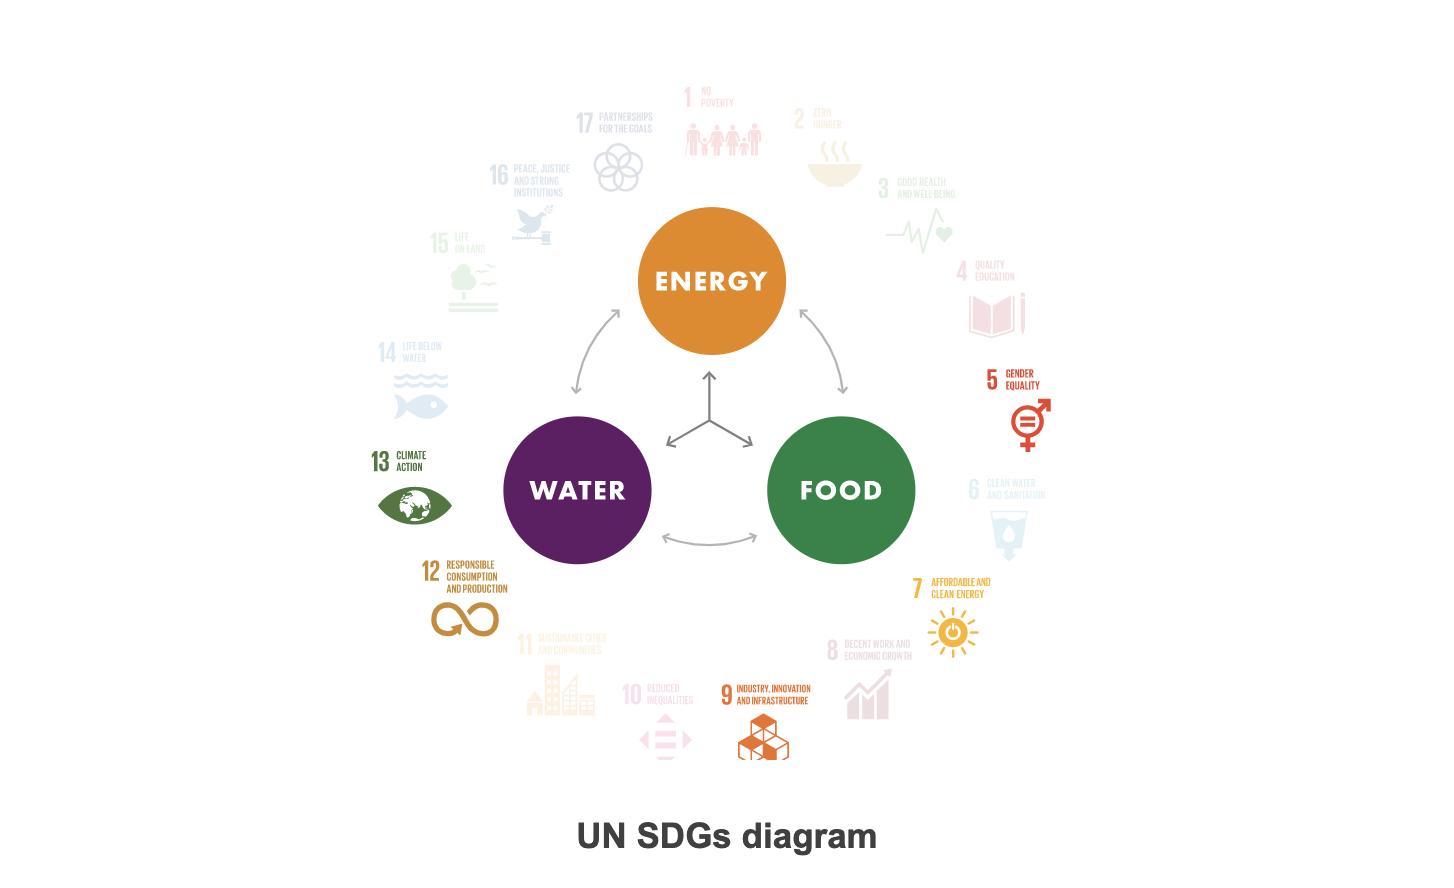 UN SDG diagram Australia